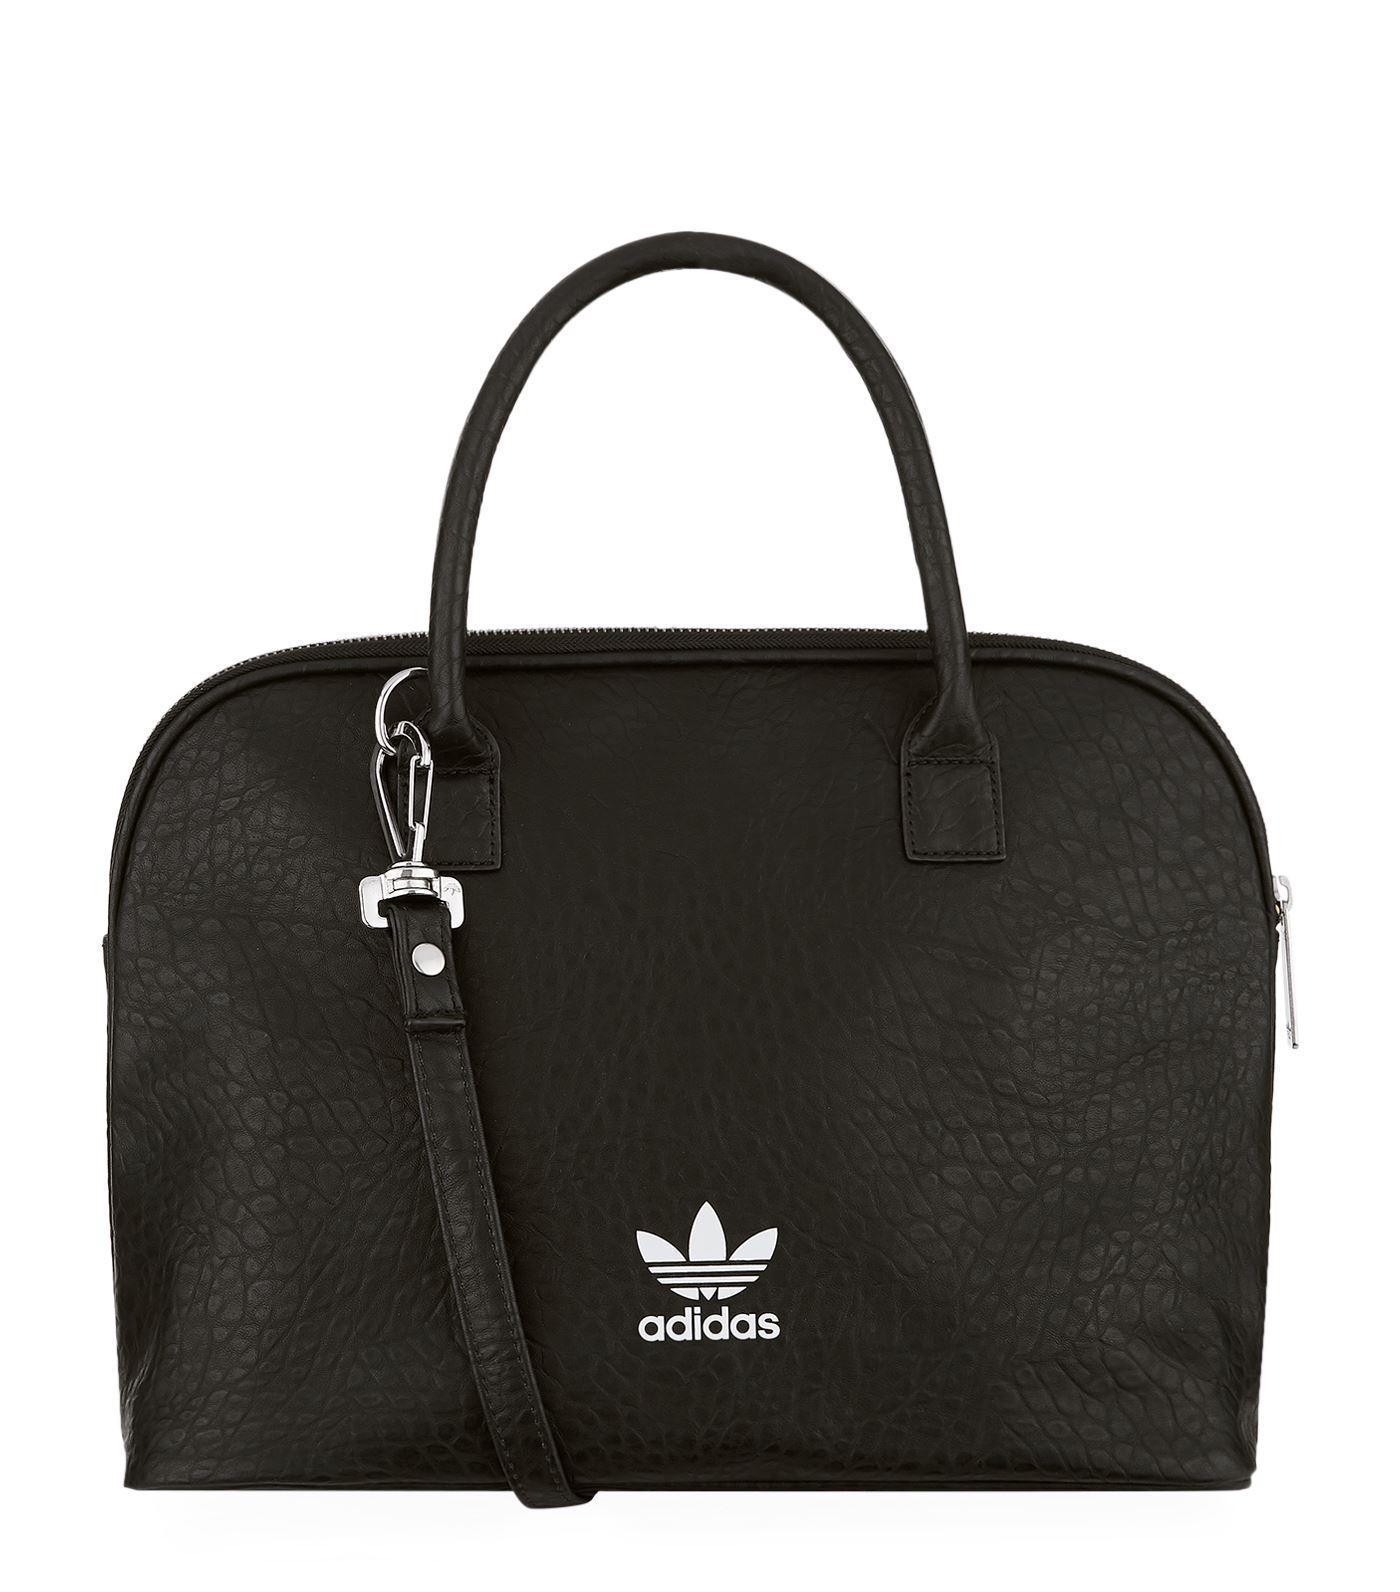 fb0c9f86ab1c adidas Originals Bowling Bag in Black - Lyst